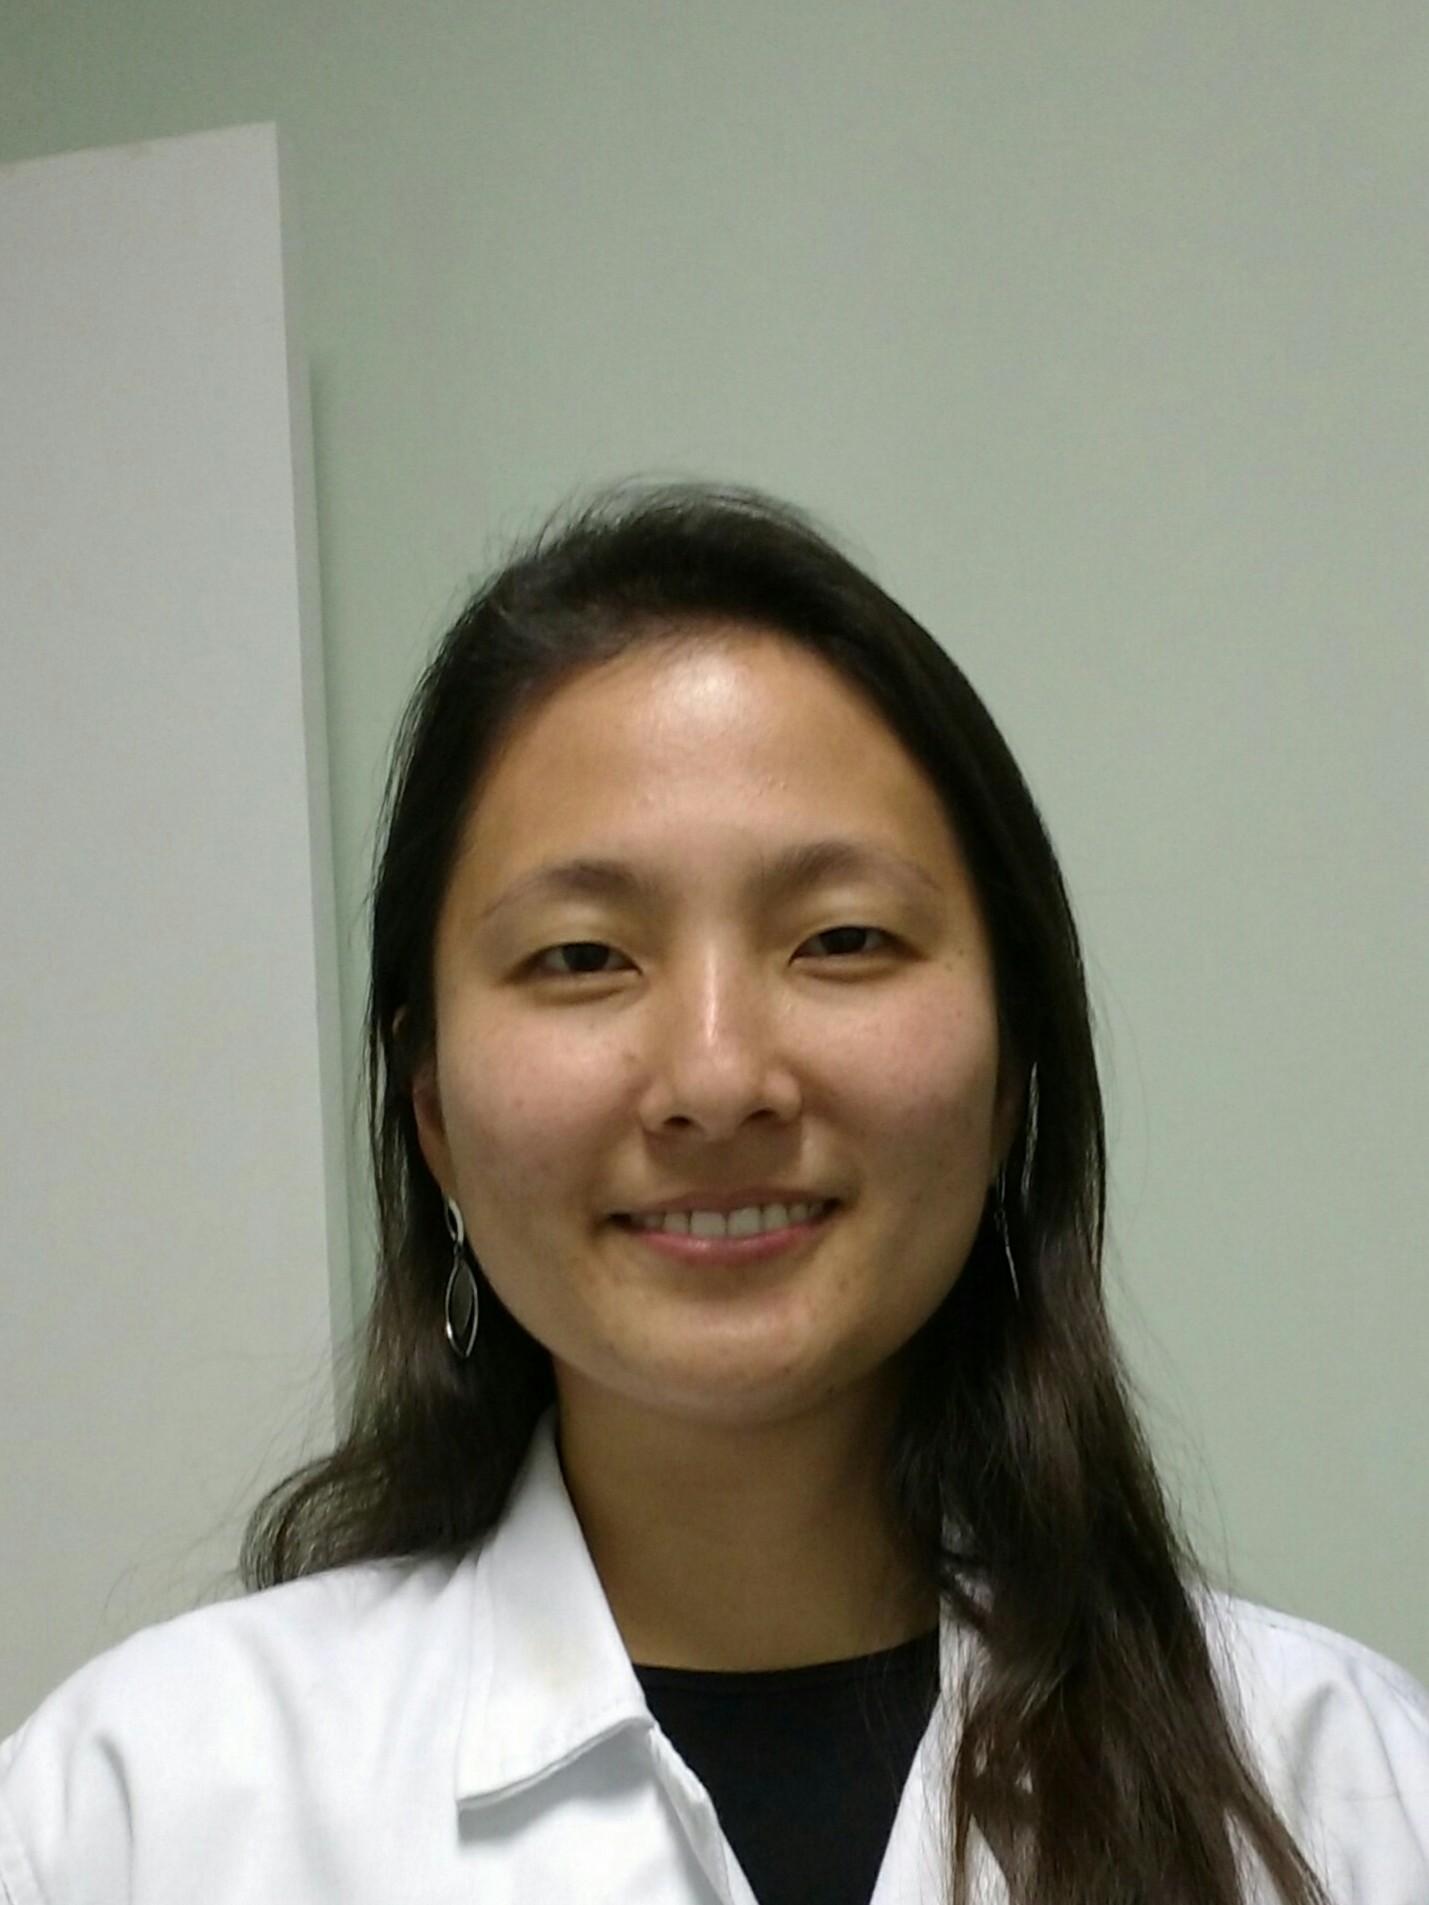 Luciene Airy Nagashima